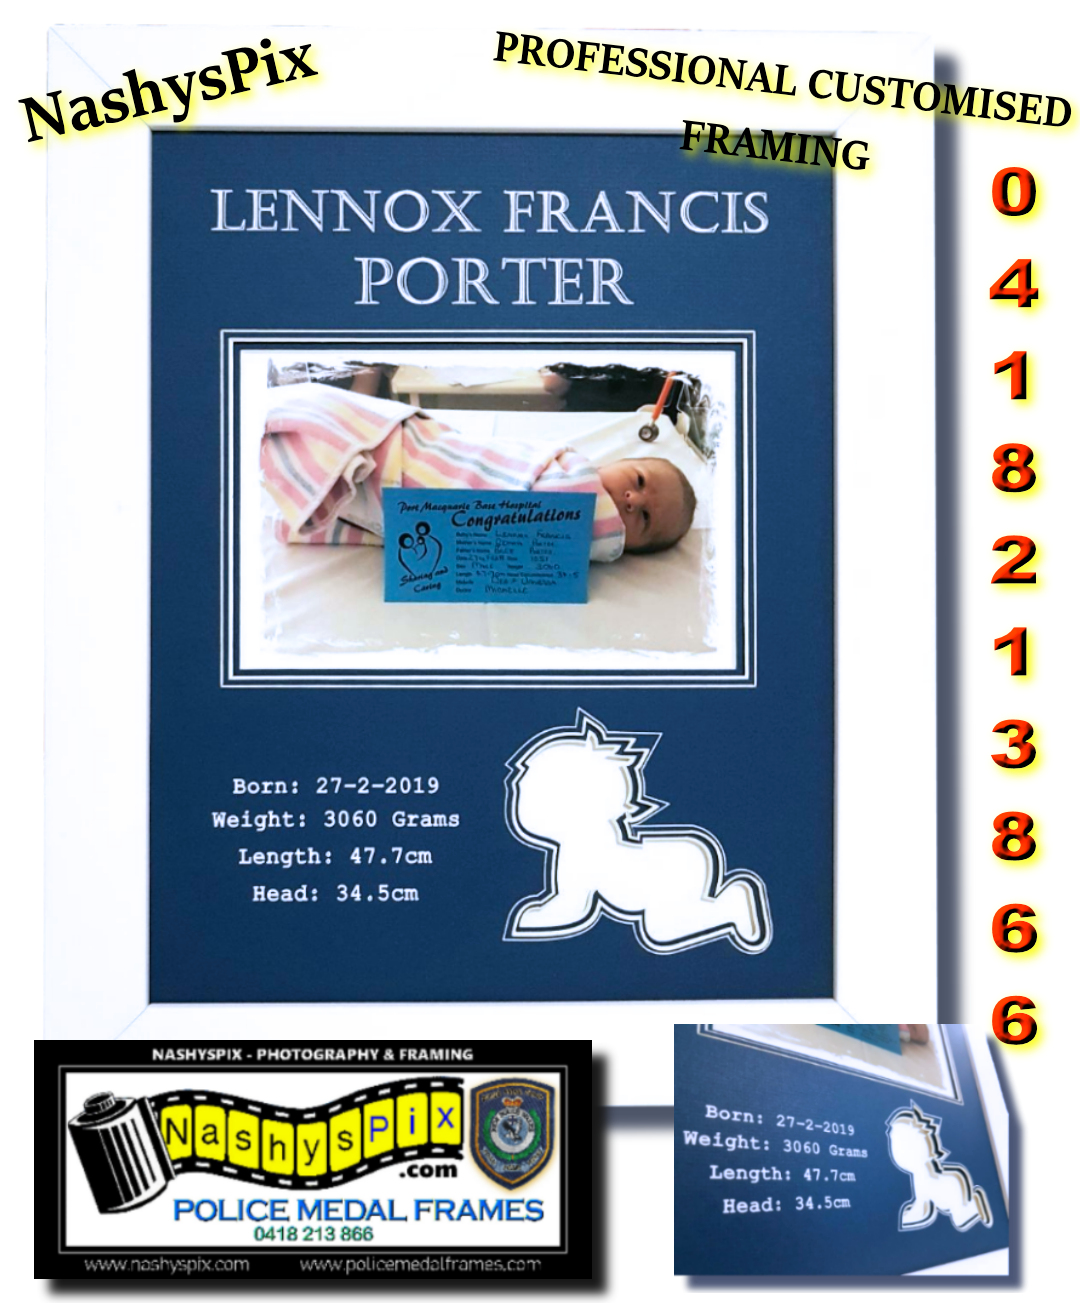 Z Lennox BABY FRAME 16-4-2019